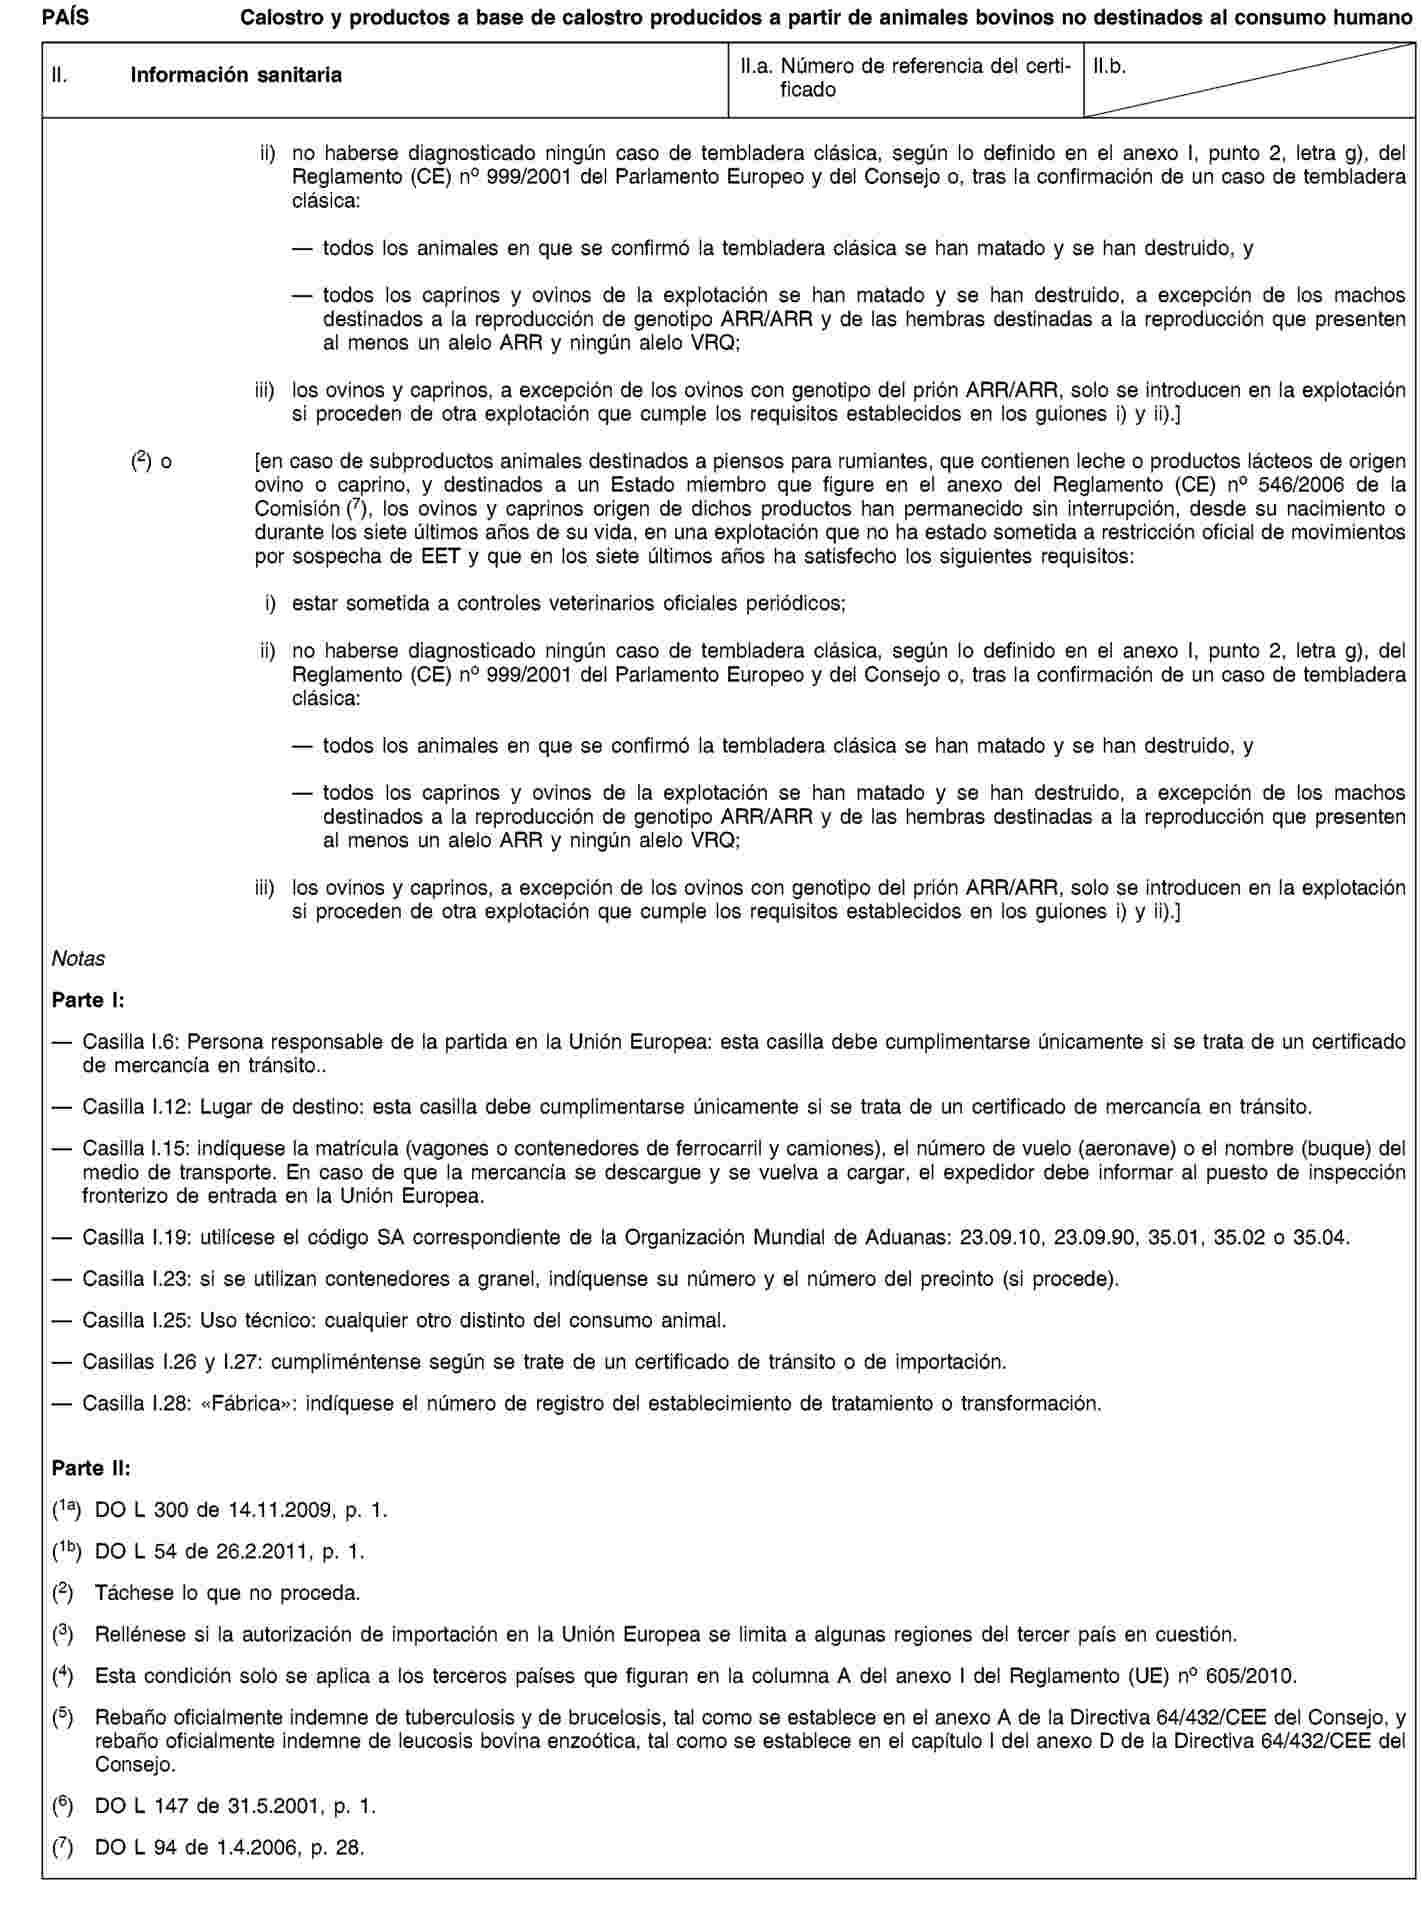 Imagen: https://eur-lex.europa.eu/resource.html?uri=uriserv:OJ.L_.2011.054.01.0001.01.SPA.xhtml.L_2011054ES.01013001.tif.jpg